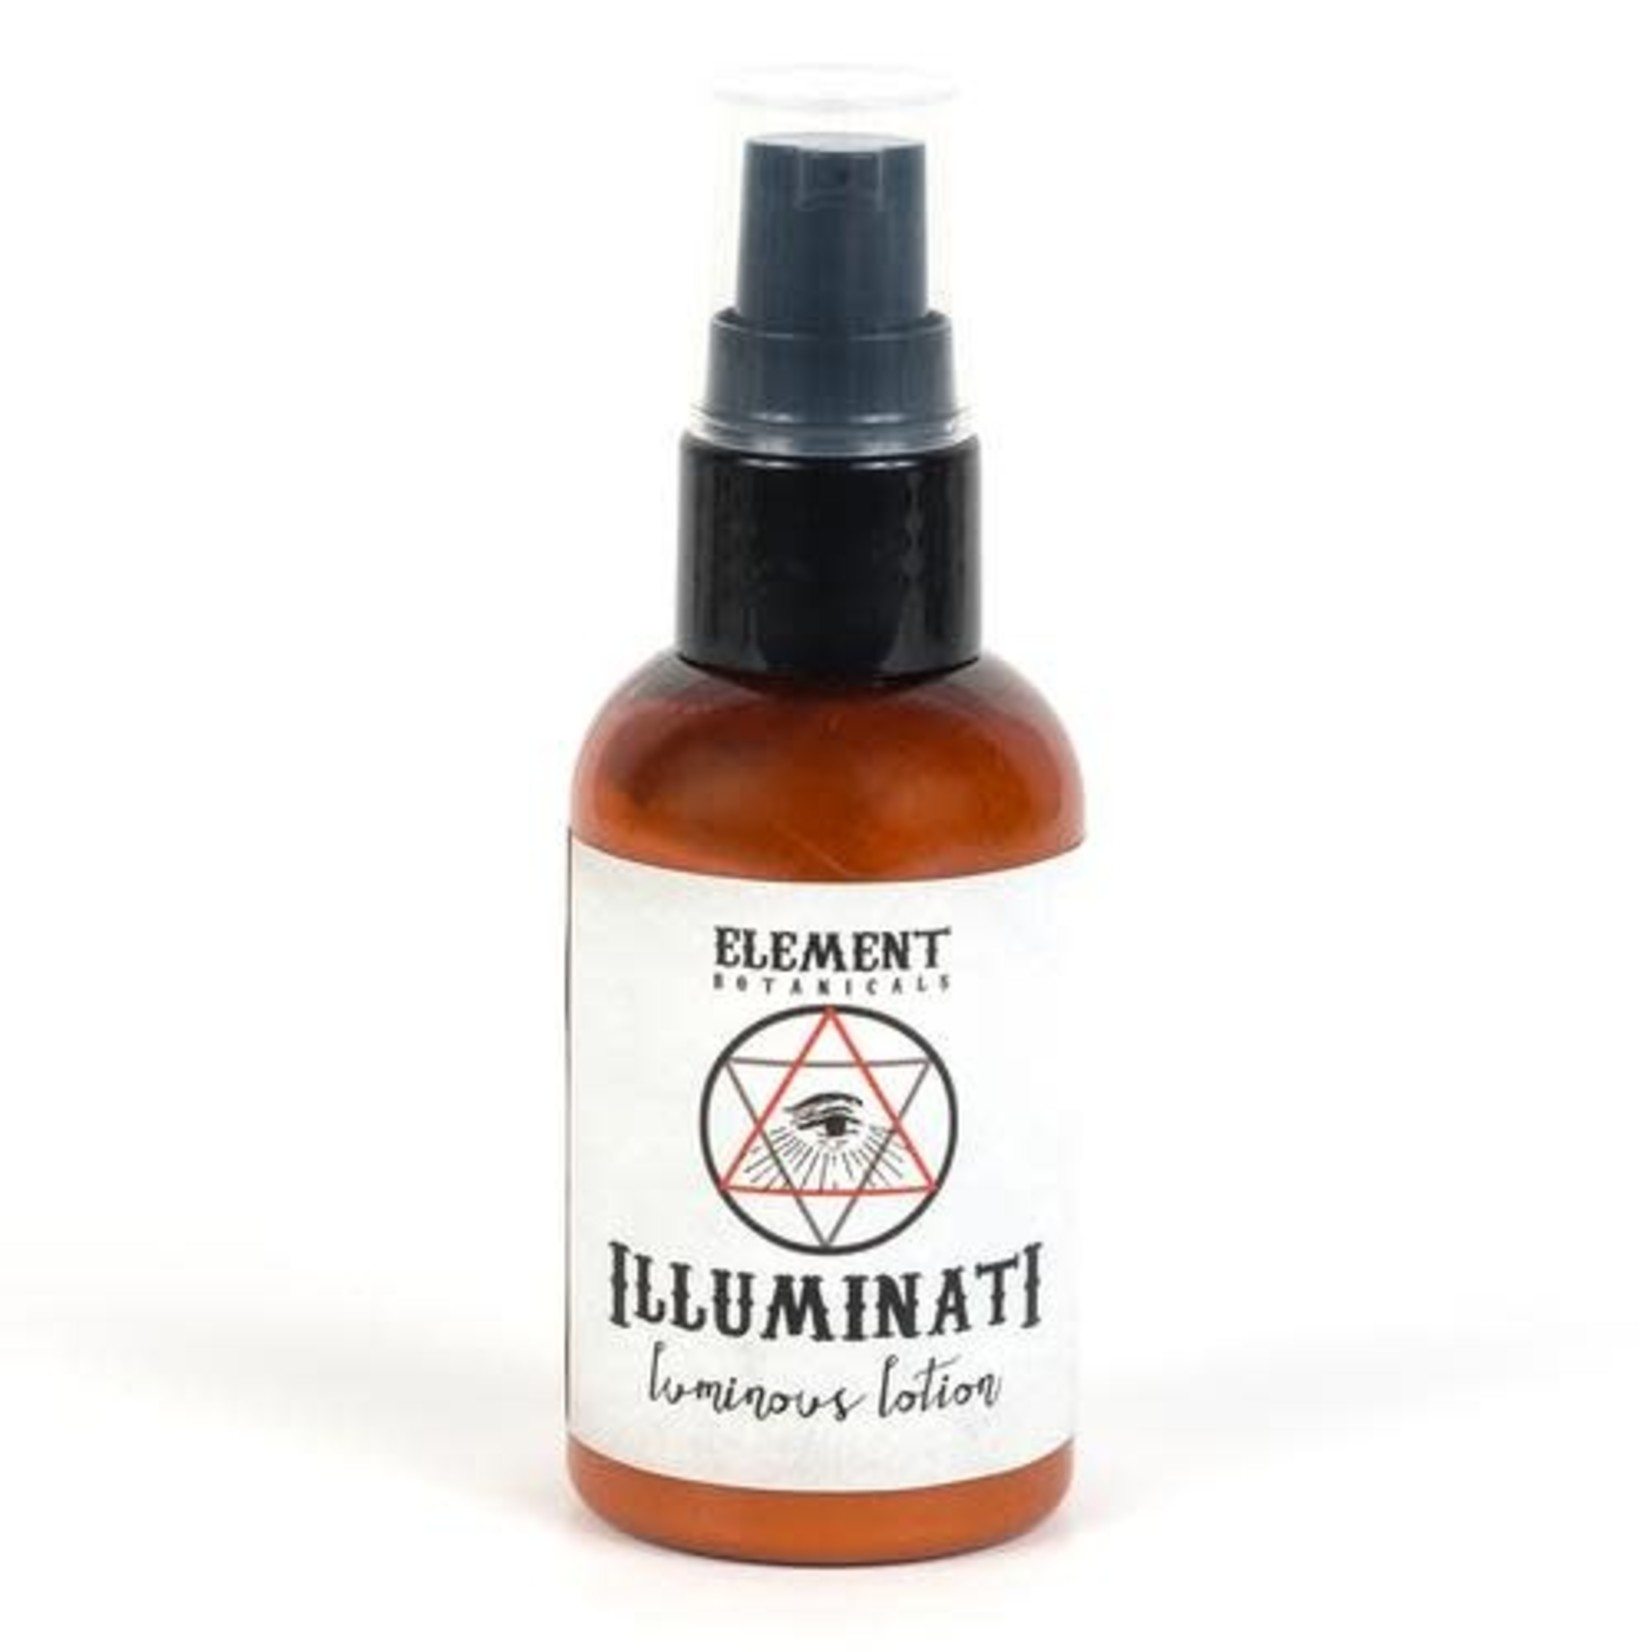 ELEMENT BOTANICALS Illuminati Luminous Lotion